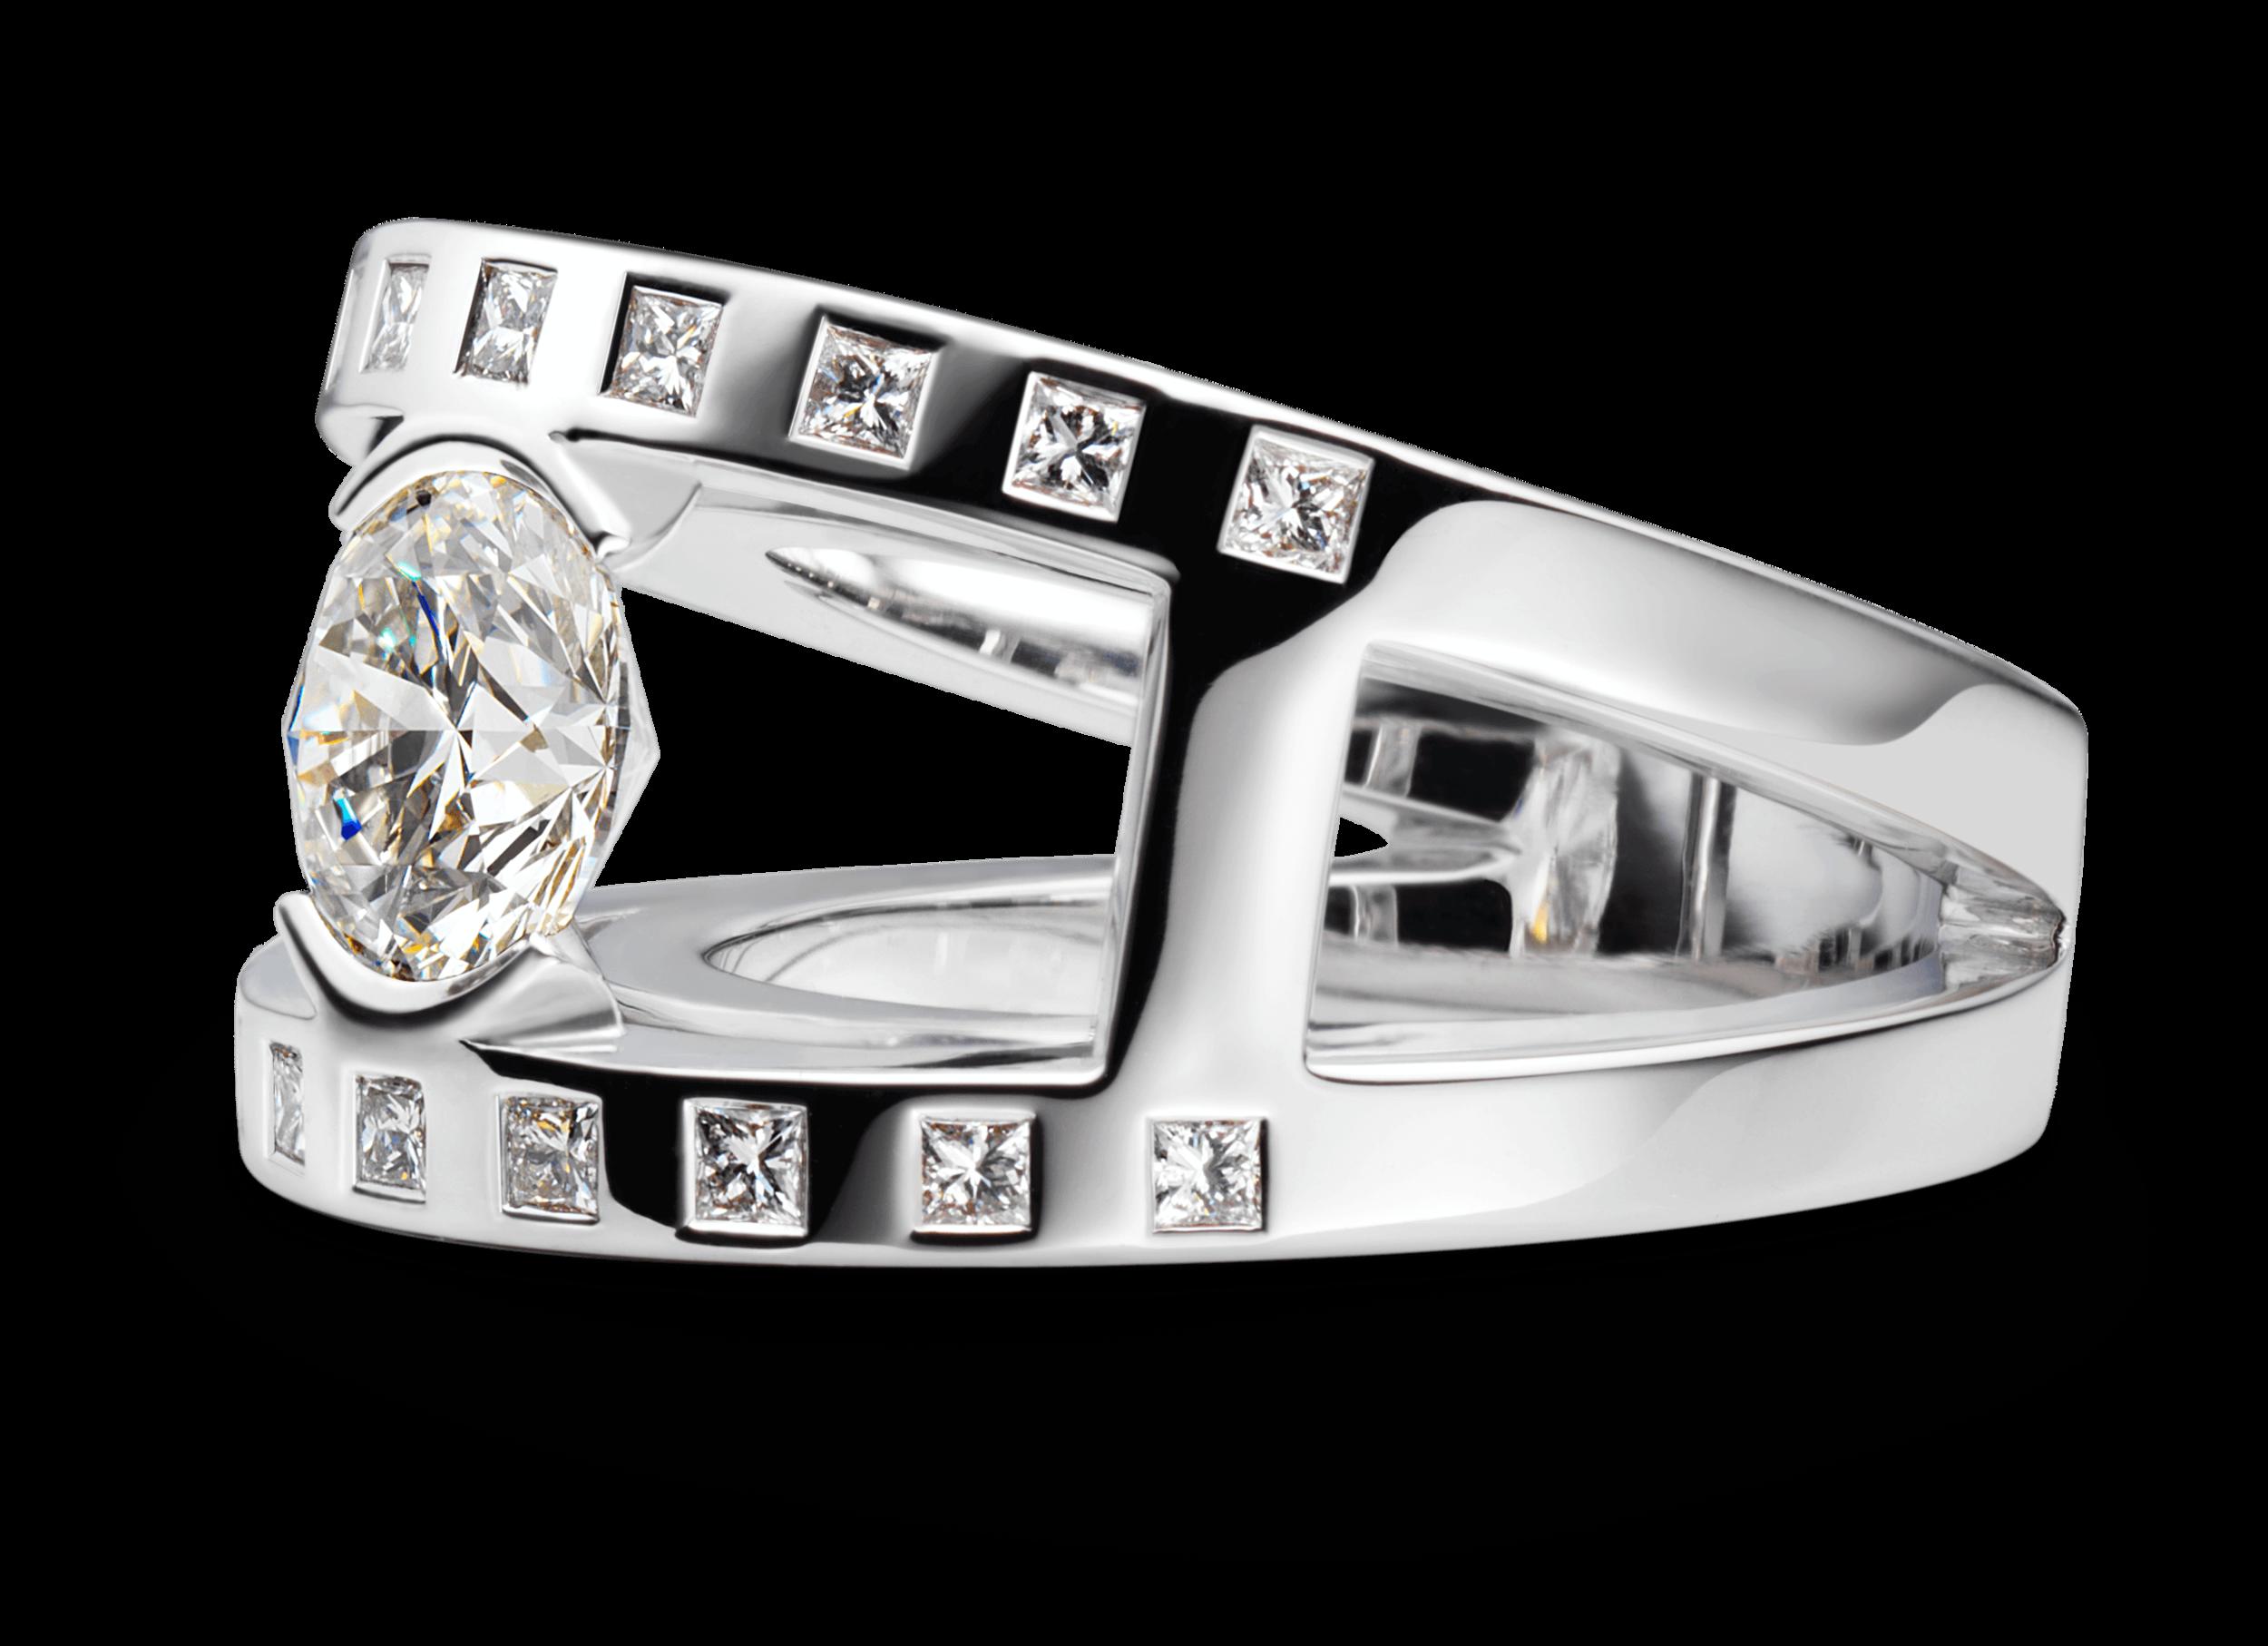 Bague Praha Joaillerie or blanc diamant 1.57 carat.png